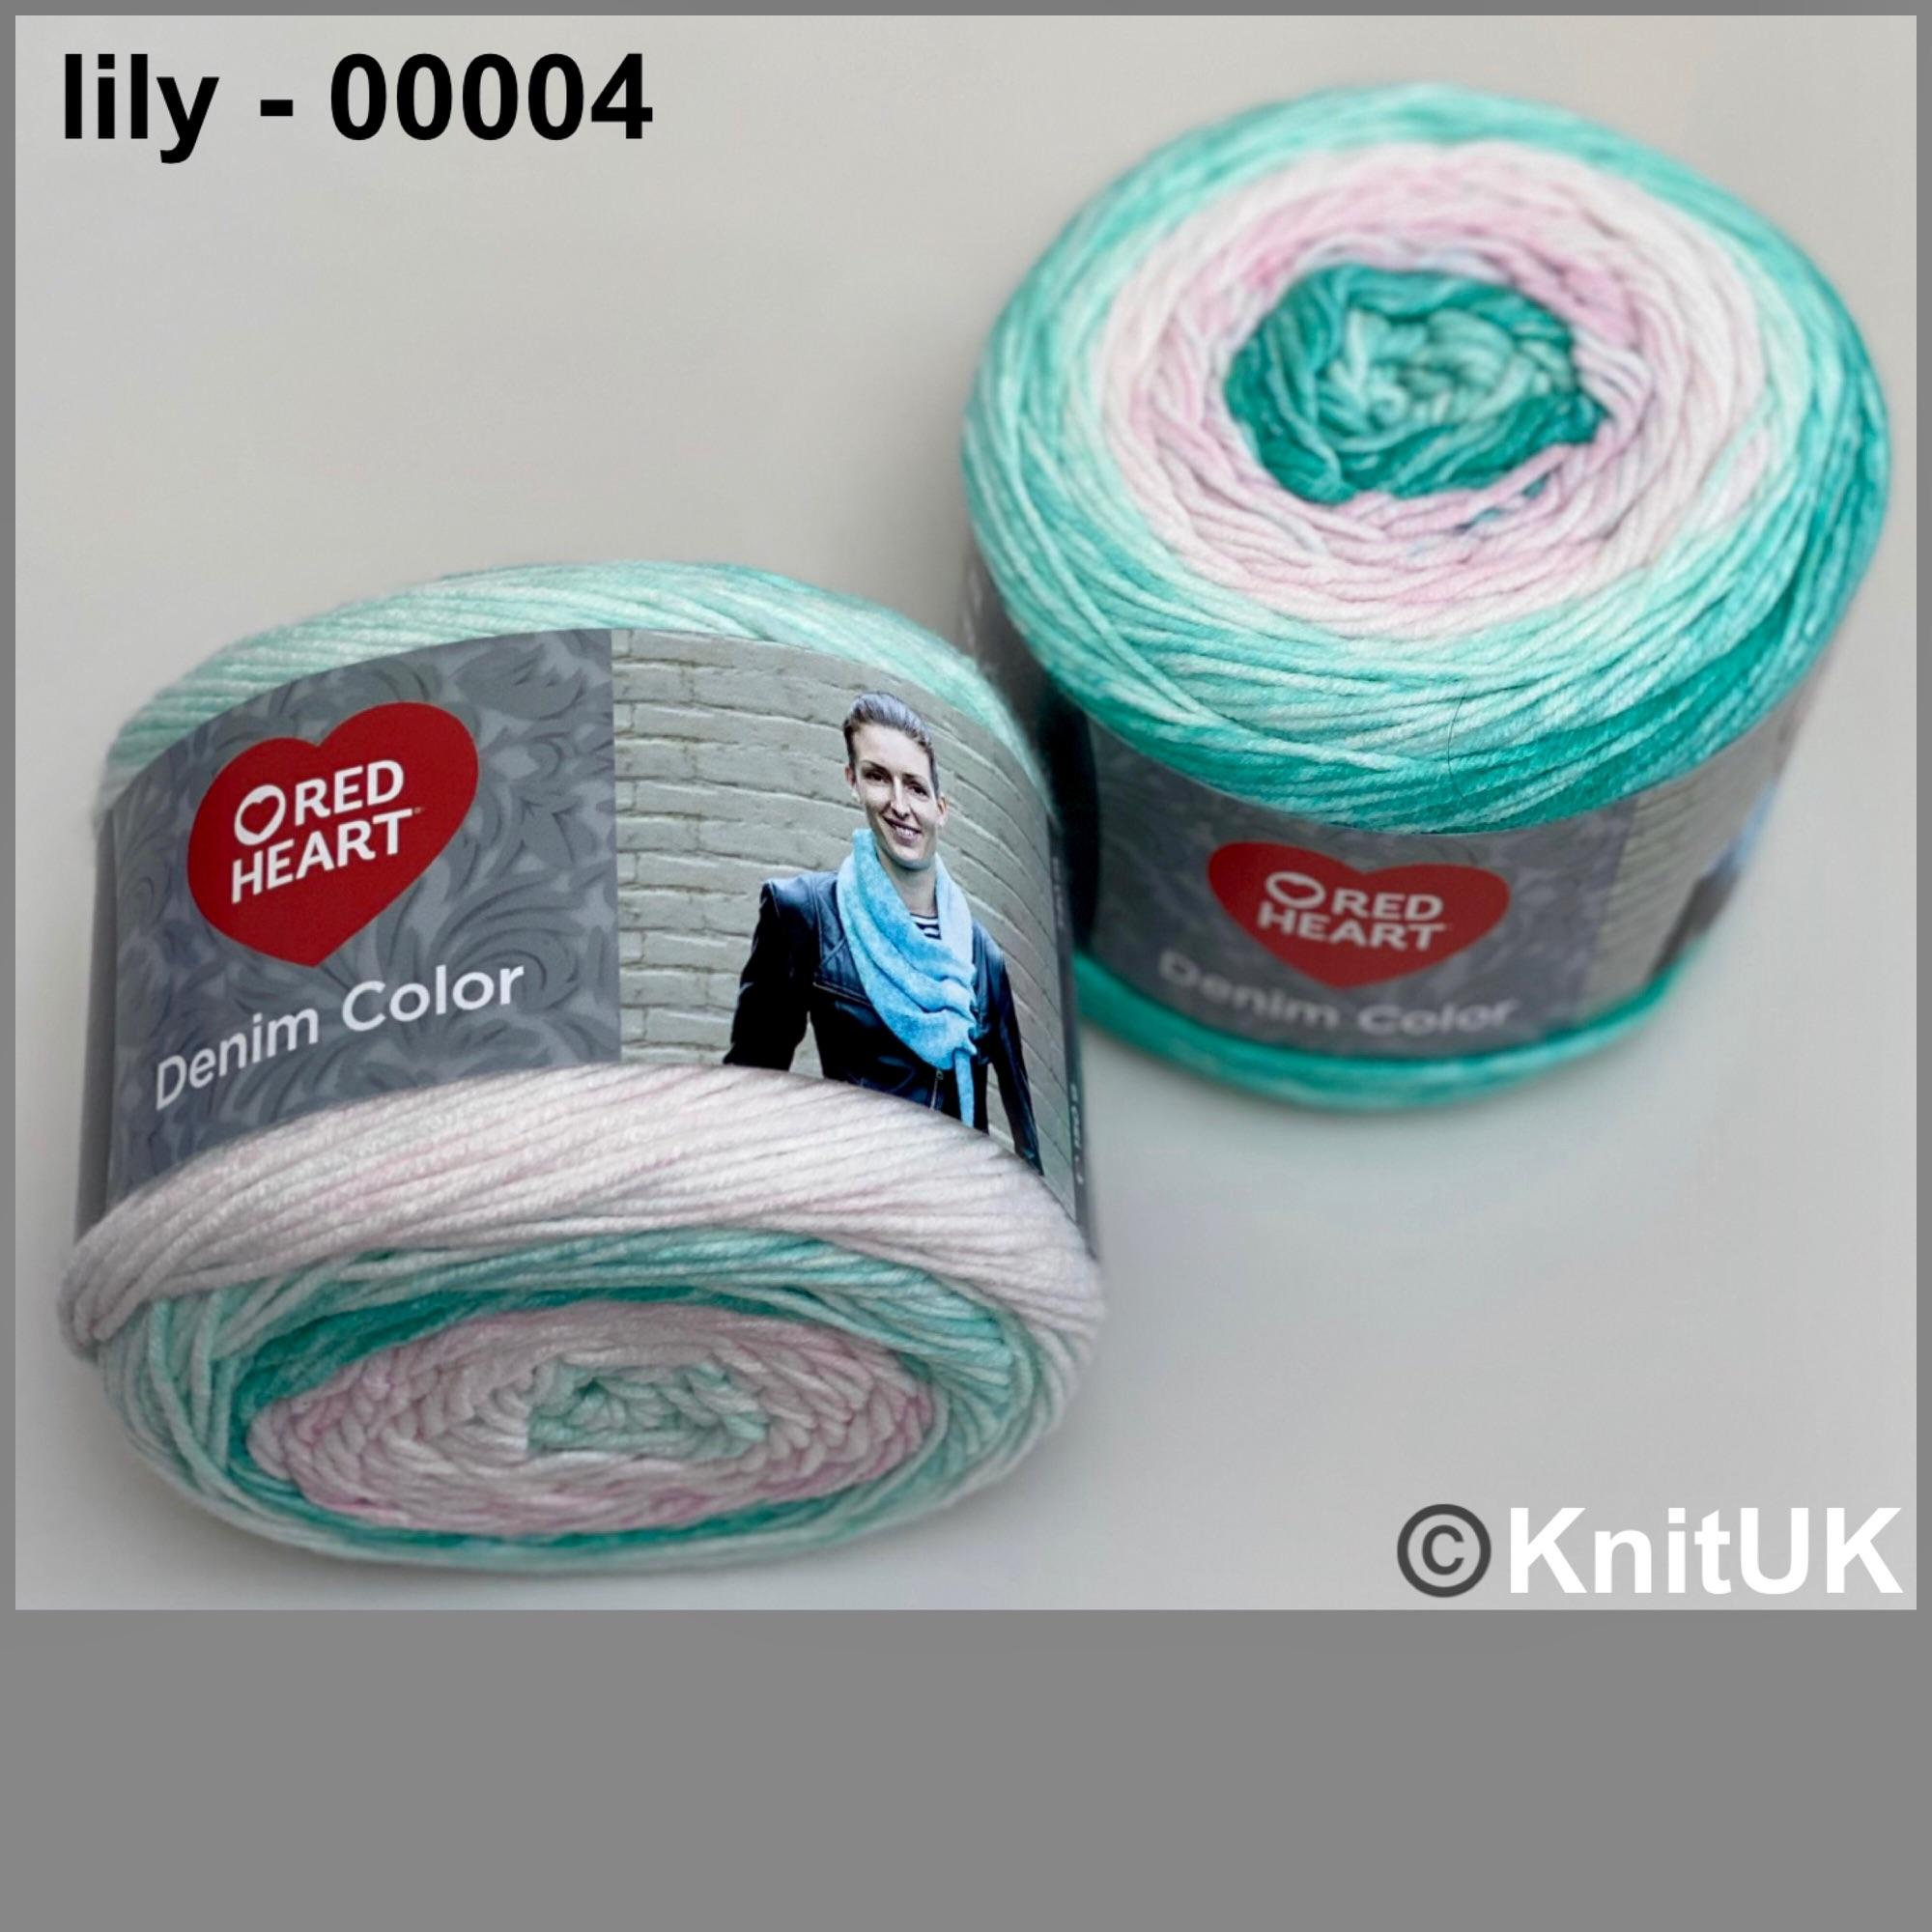 Red heart denim color lily colour acrylic yarn loom knitting crochet